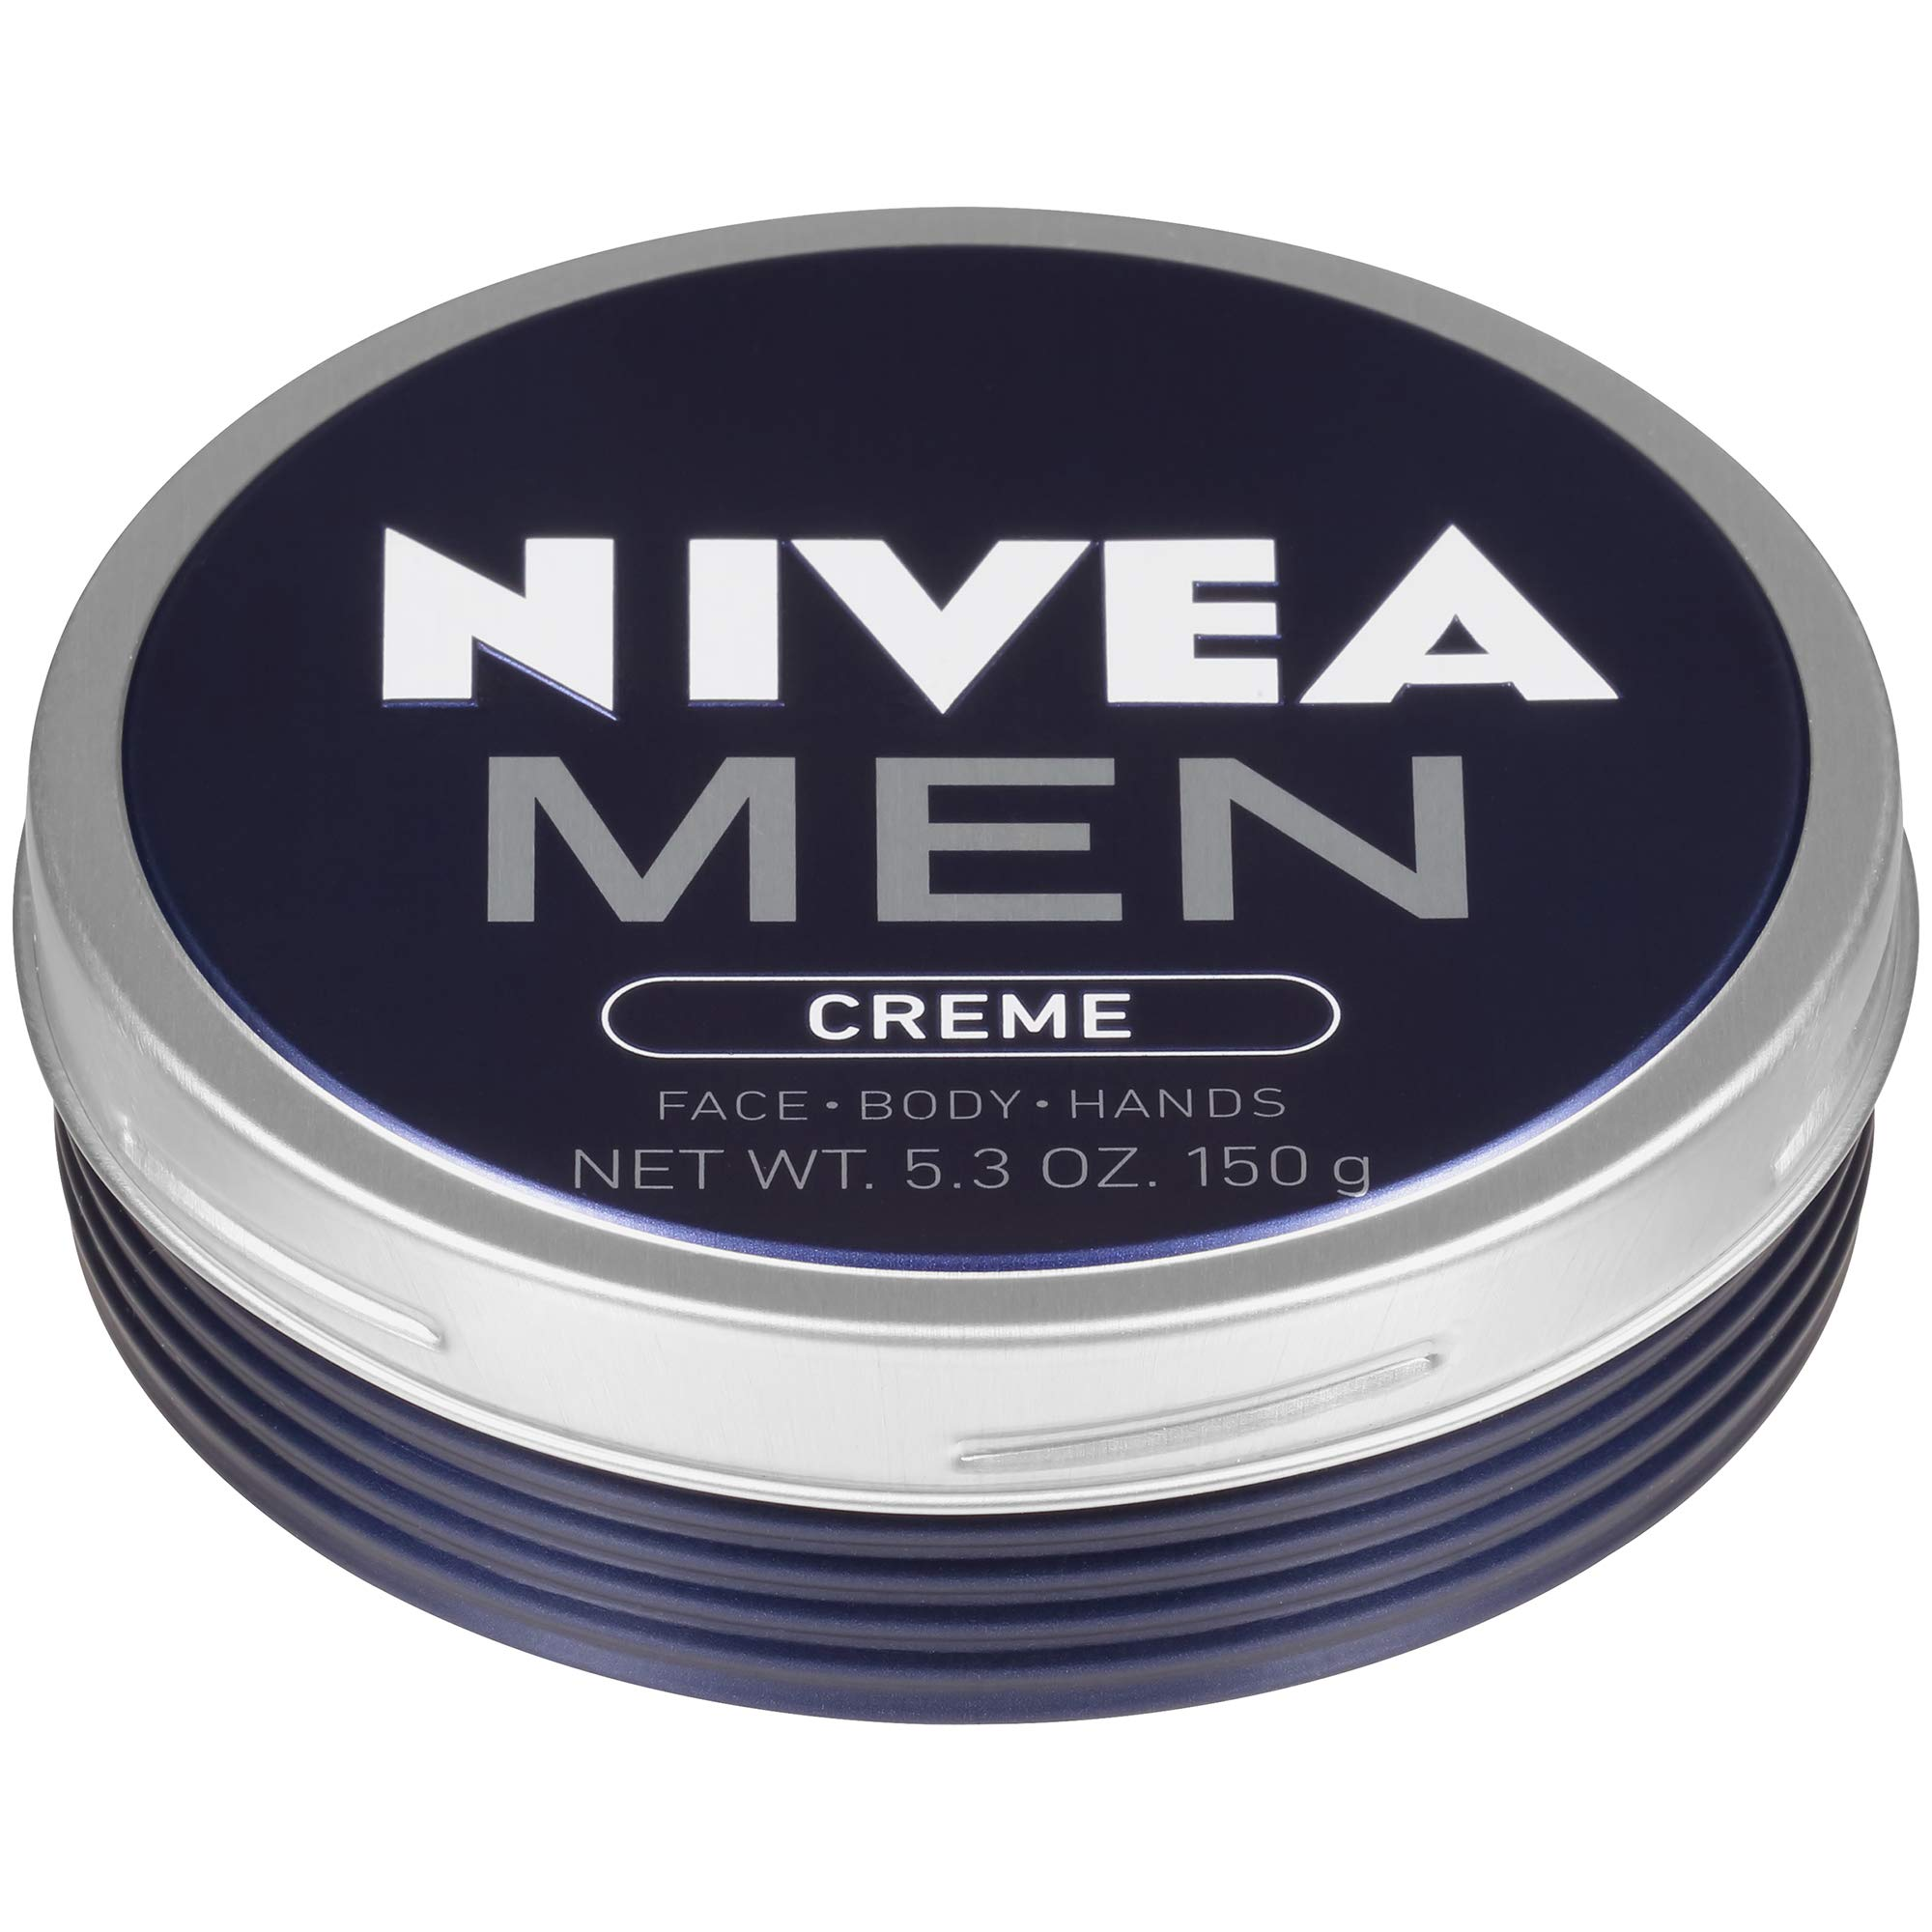 NIVEA Men Creme - Multipurpose Cream for Men - Face, hand and Body Lotion - 5.3 oz. Tin